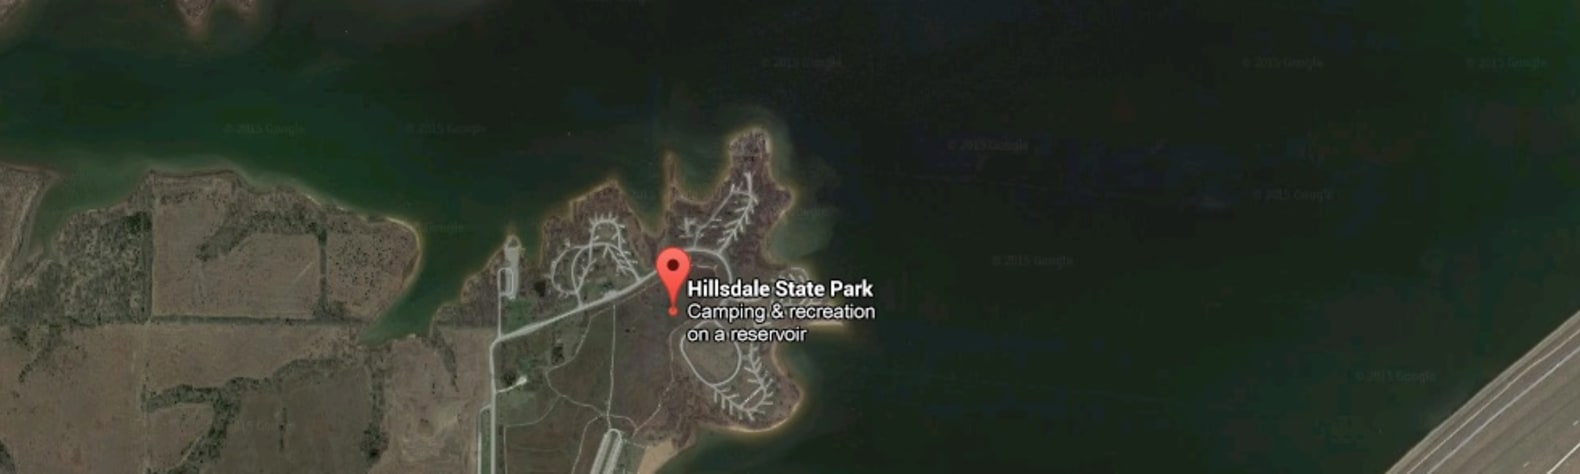 Hillsdale State Park